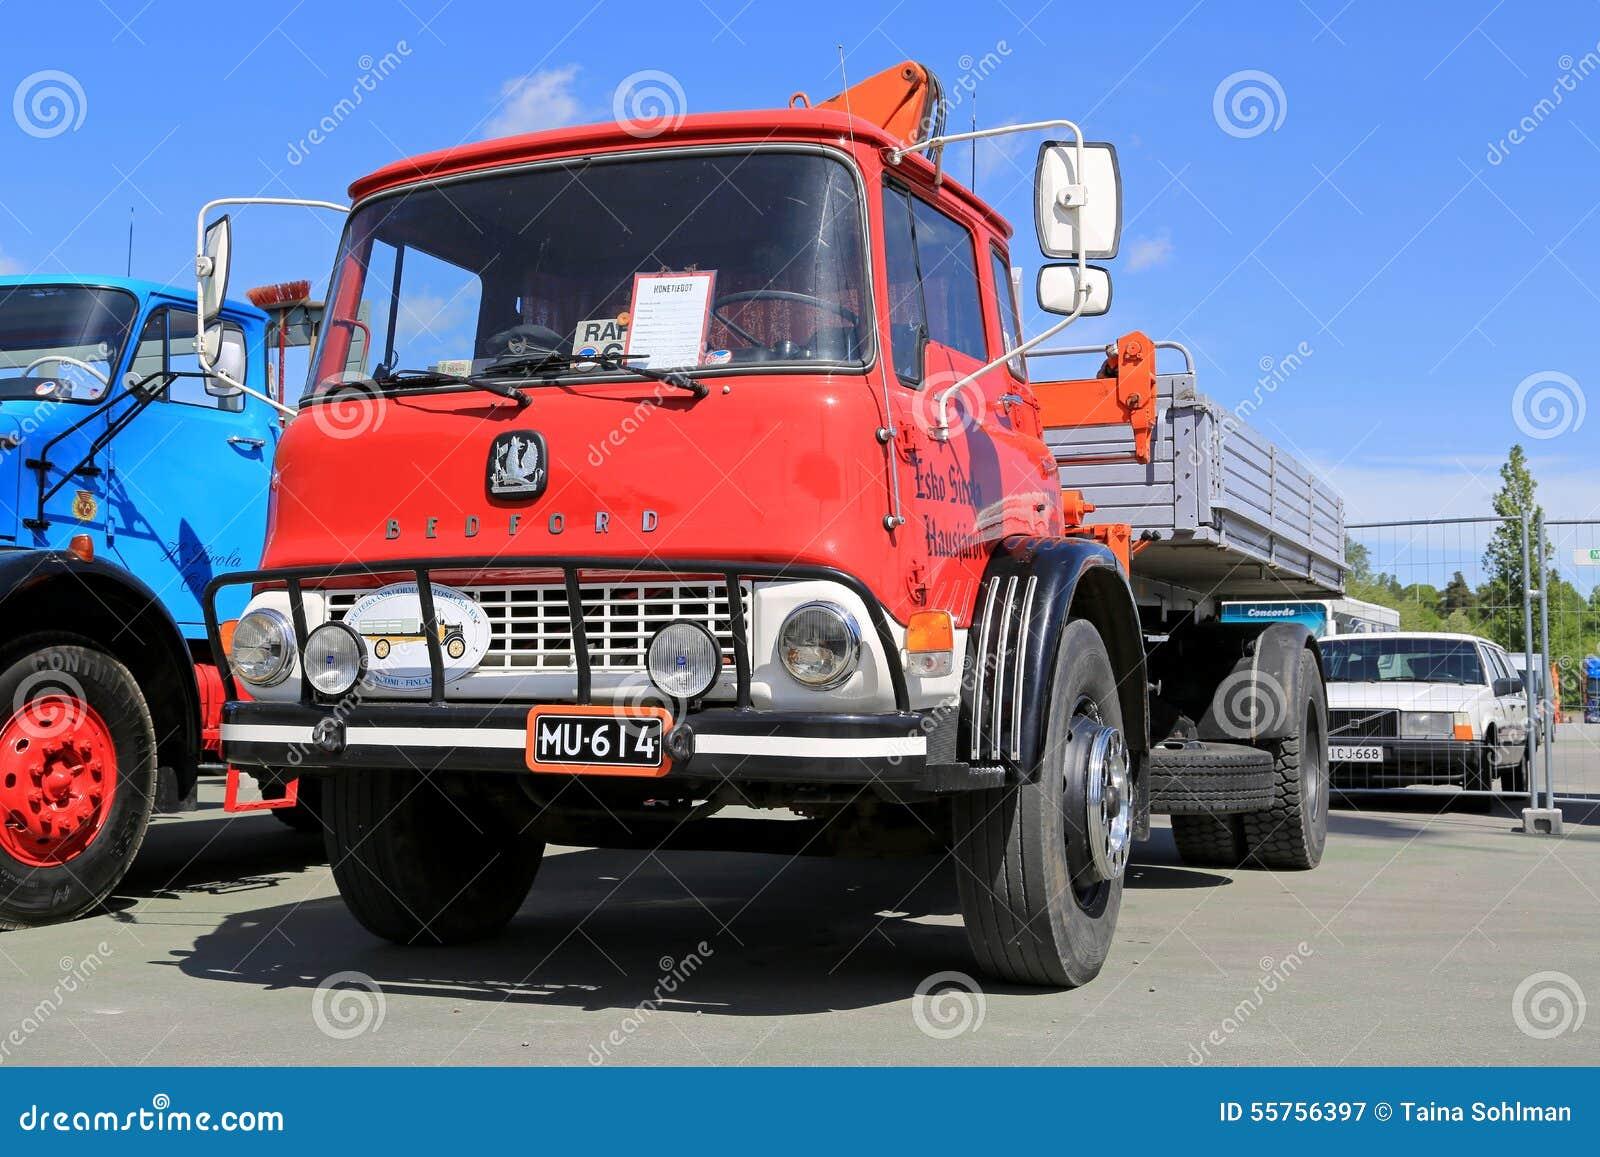 Klassiek bedford truck 1972 redactionele fotografie afbeelding 55756397 - Klassiek bed ...